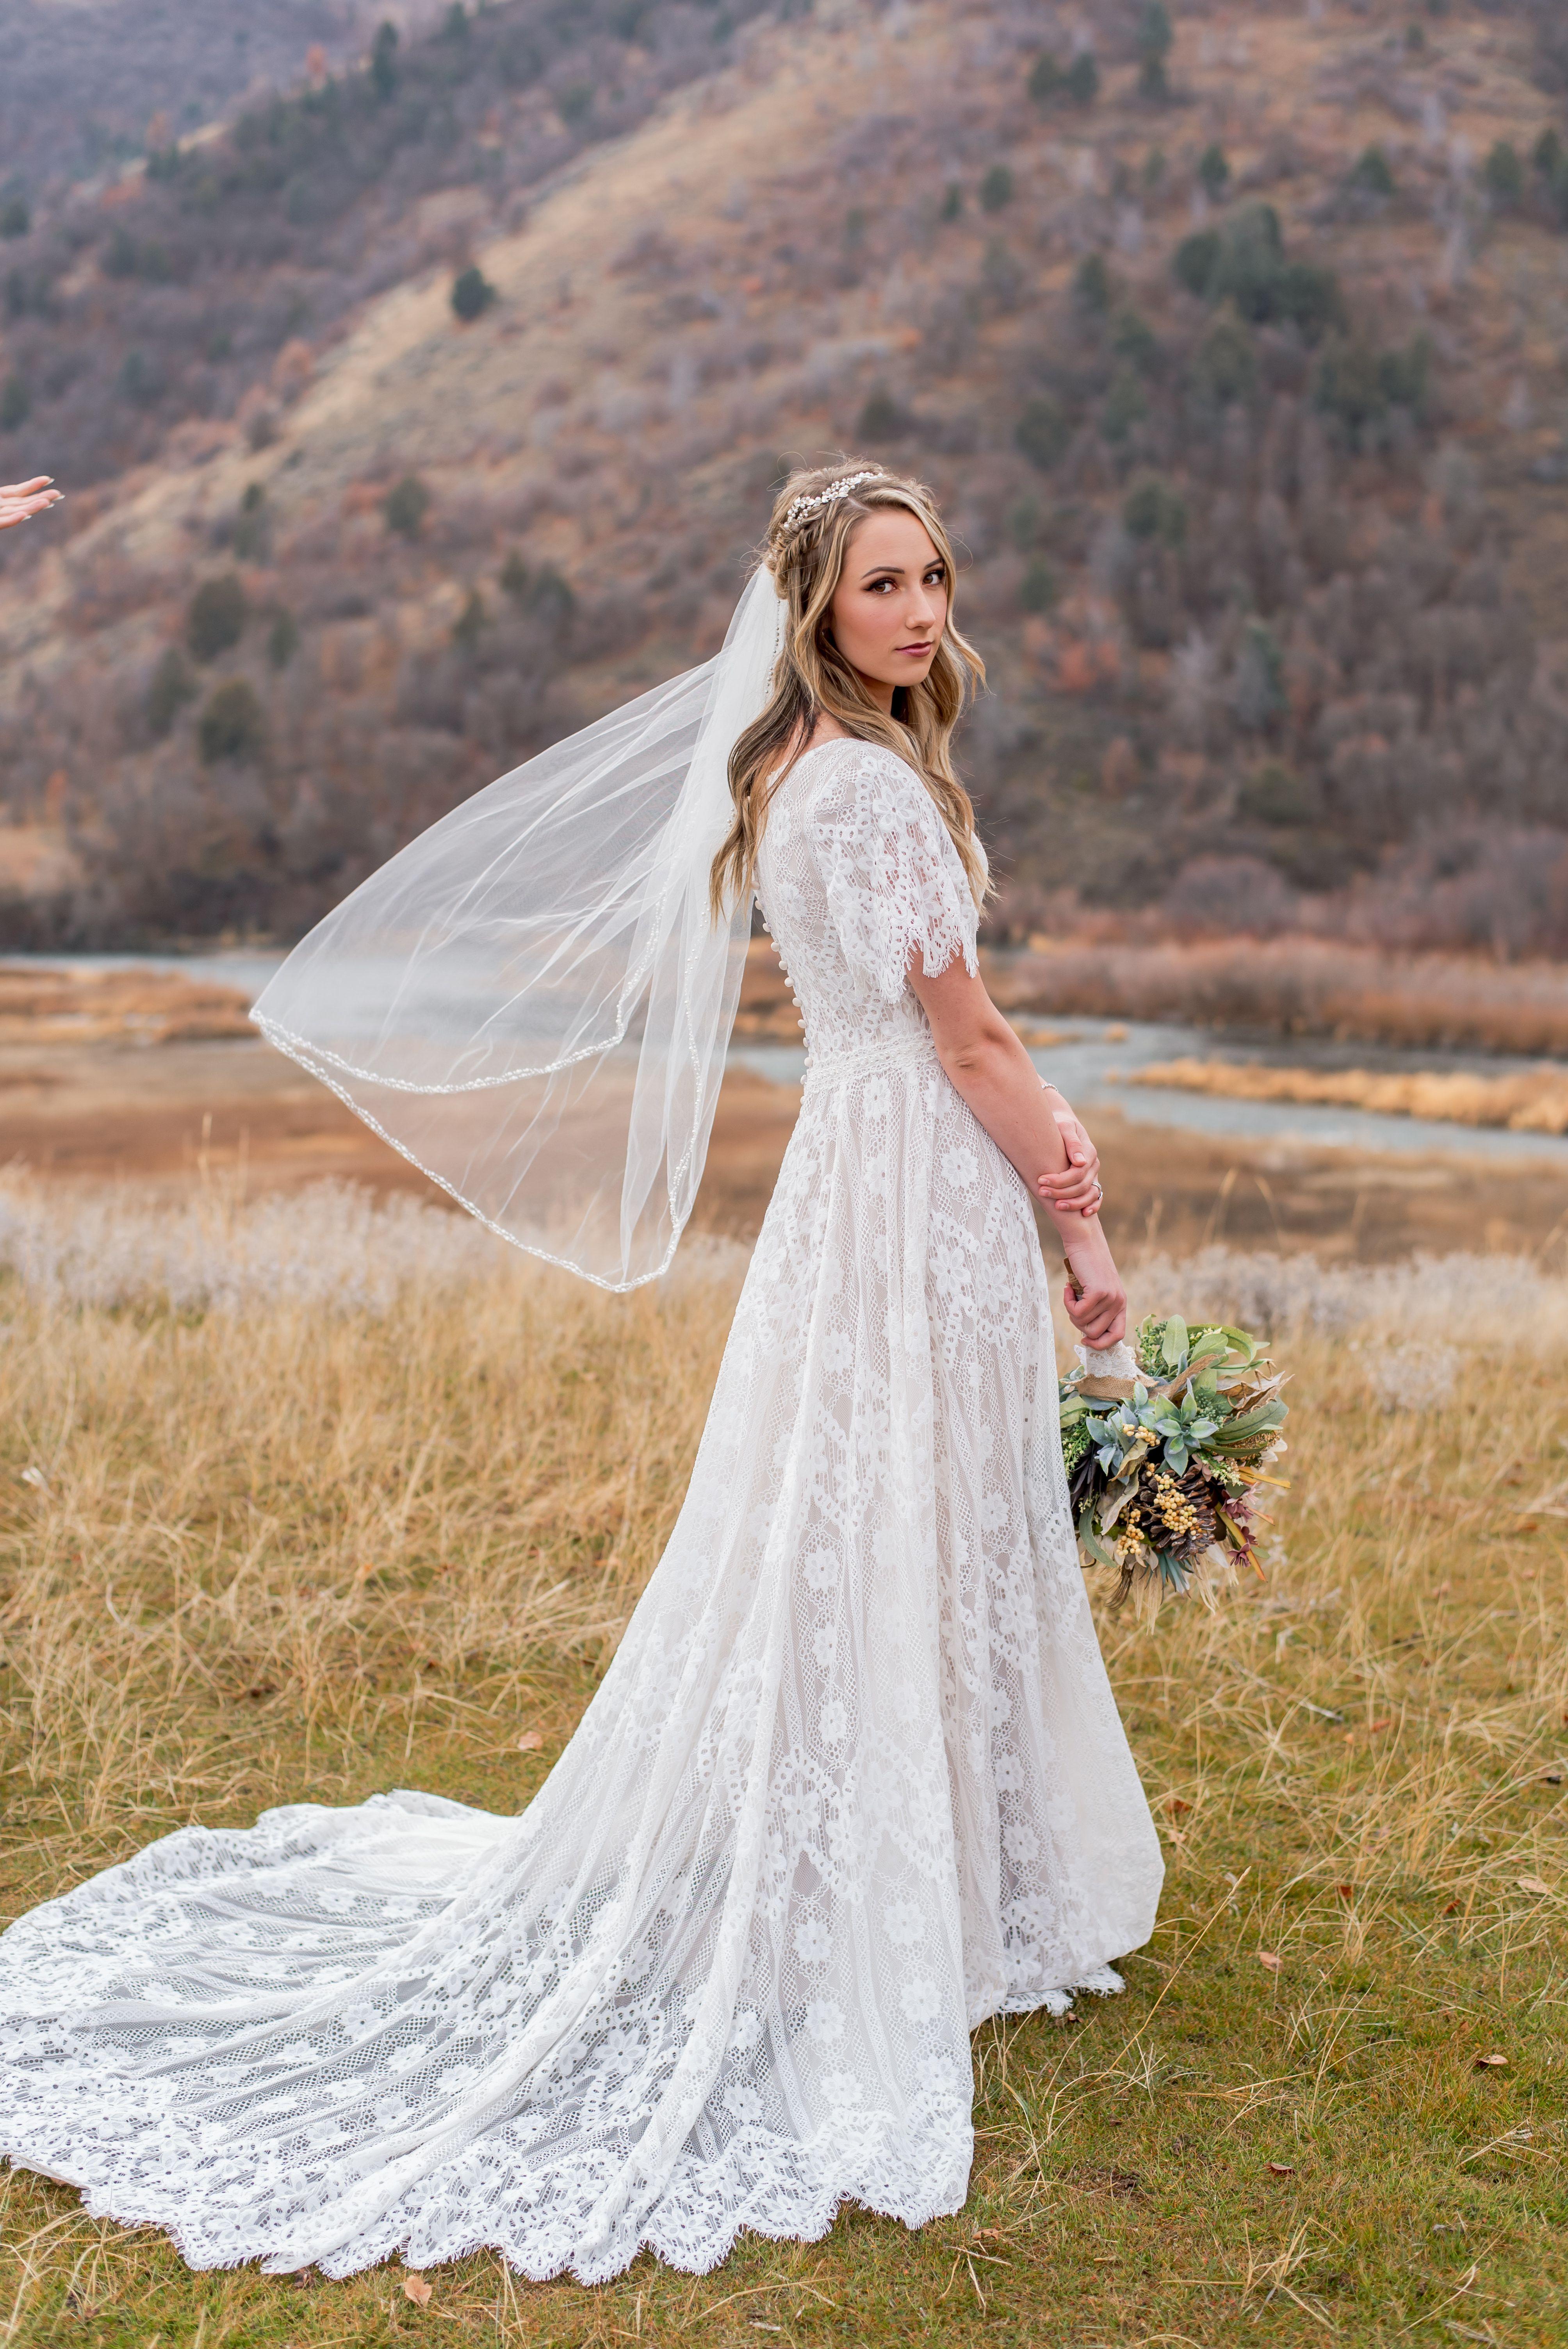 Calabria Modest Lace Wedding Dresses Modest Wedding Dresses Wedding Dresses Lace [ 6016 x 4016 Pixel ]